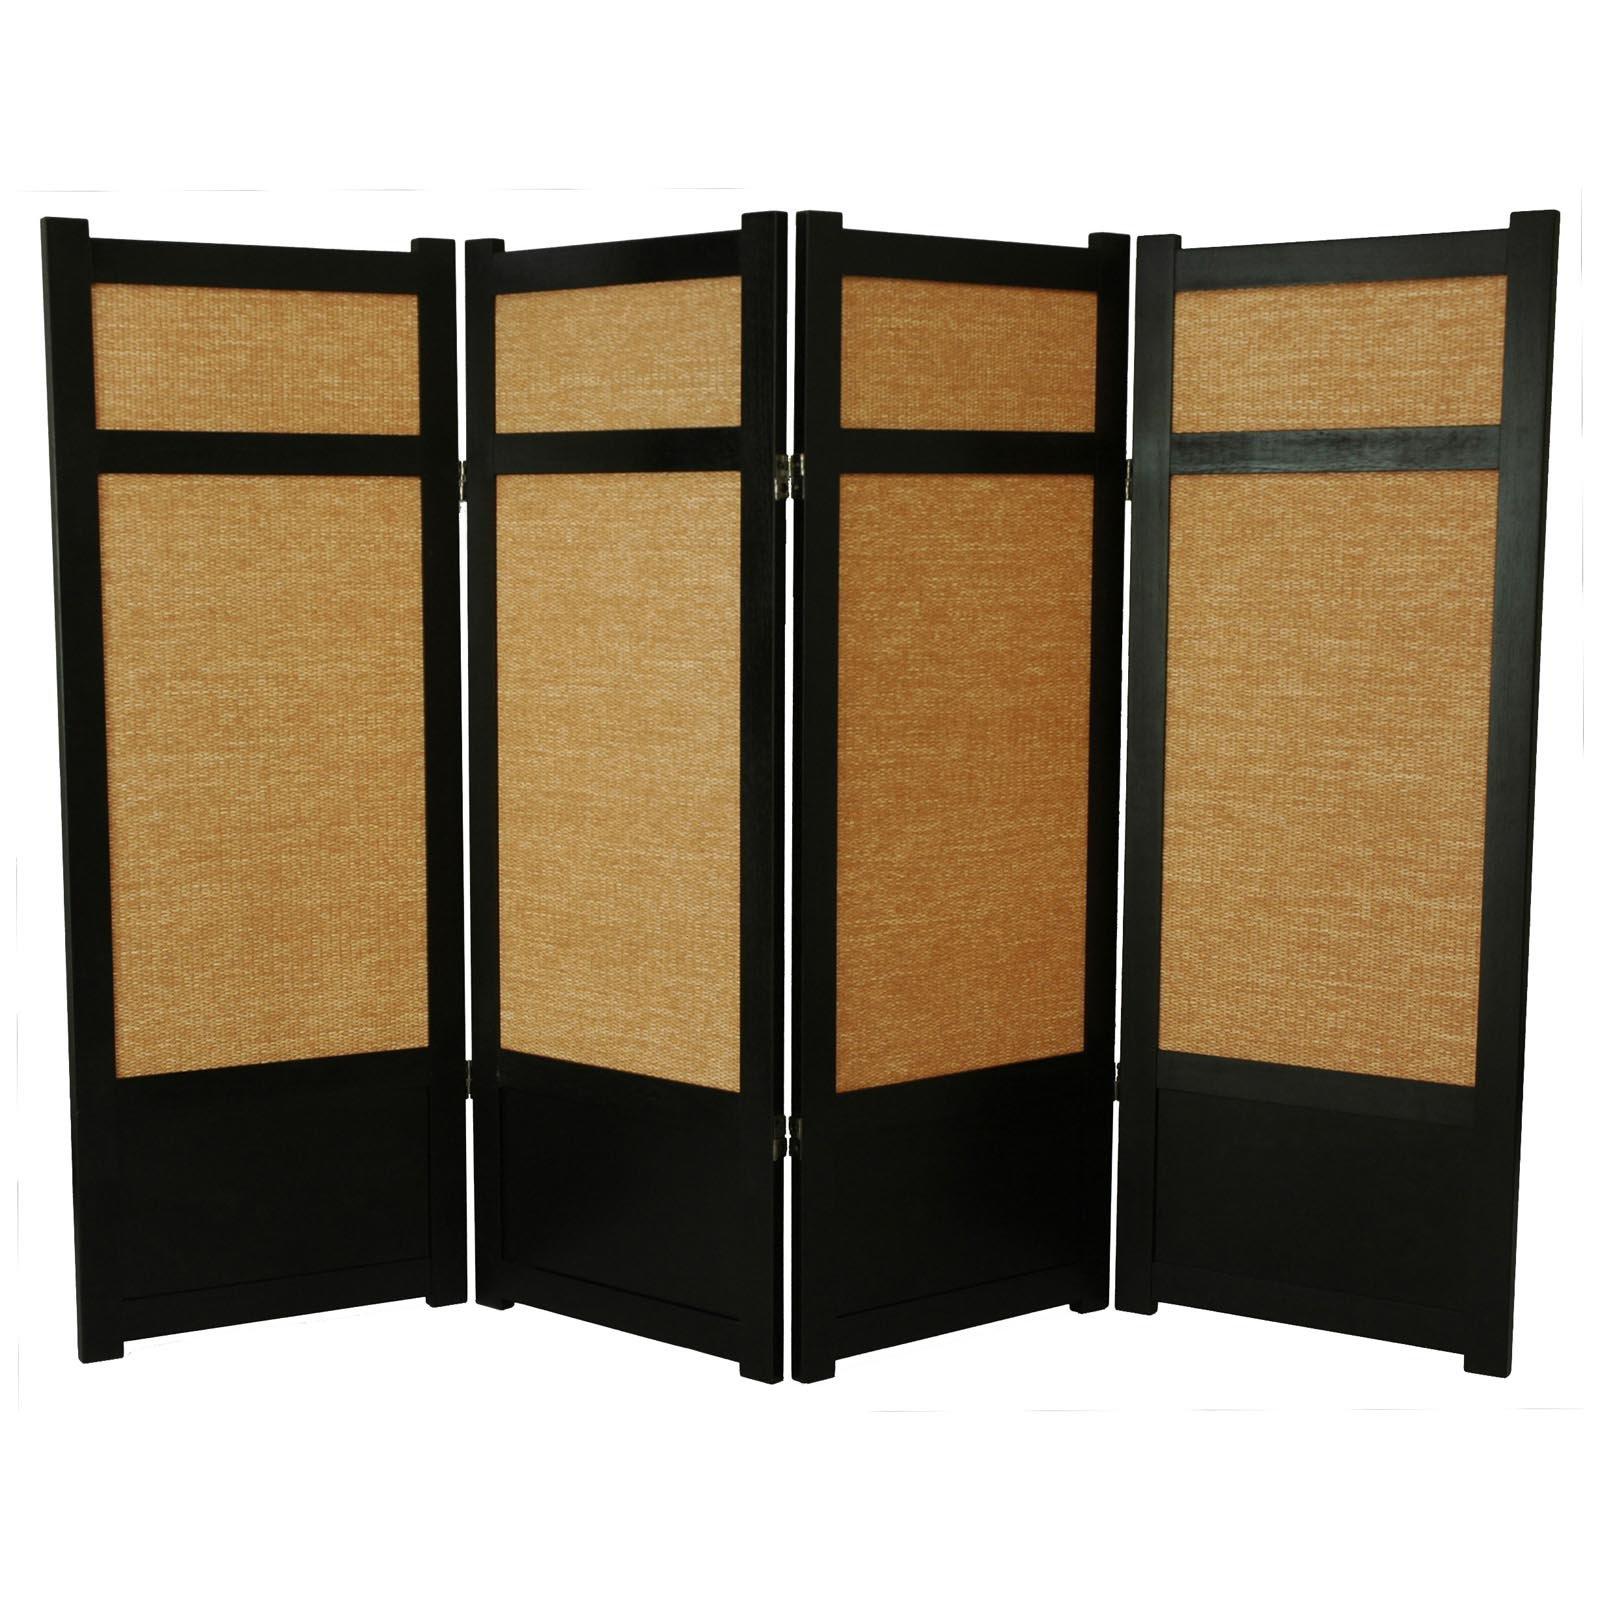 Oriental Furniture Low Jute Fiber Shoji Screen Room Divid...